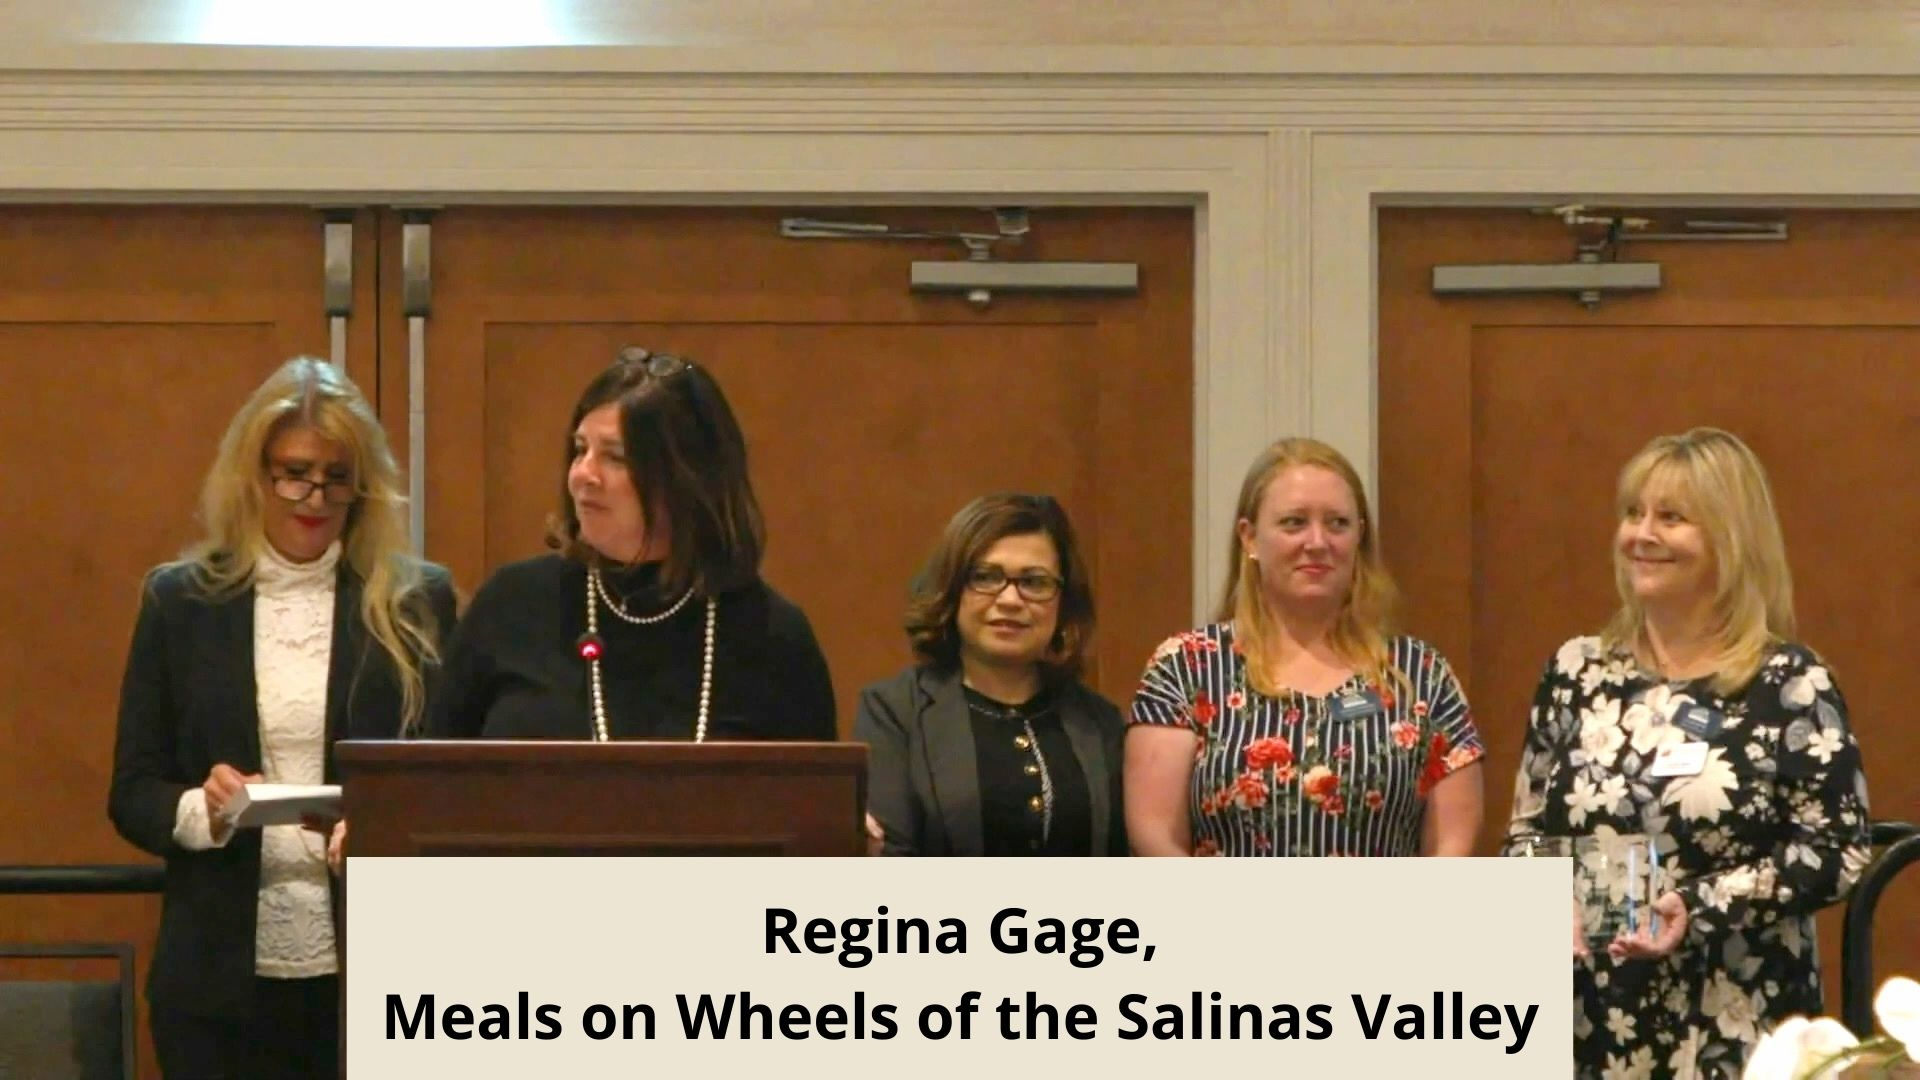 Regina Gage, Meals on Wheels of the Salinas Valley